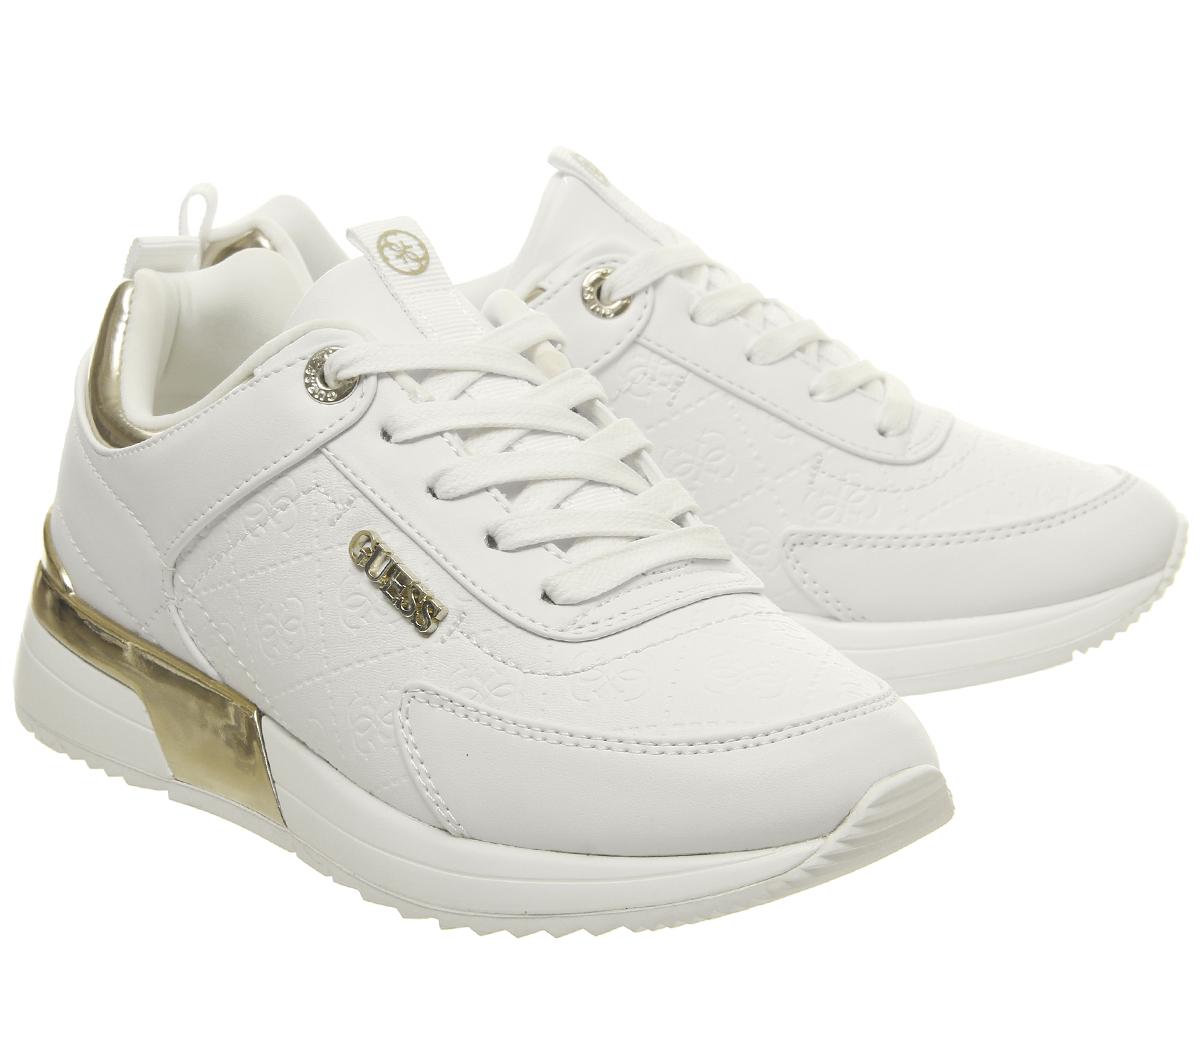 e43e4b42313 Womens-Guess-Marlyn-Sneakers-White-Gold-Flats thumbnail 10